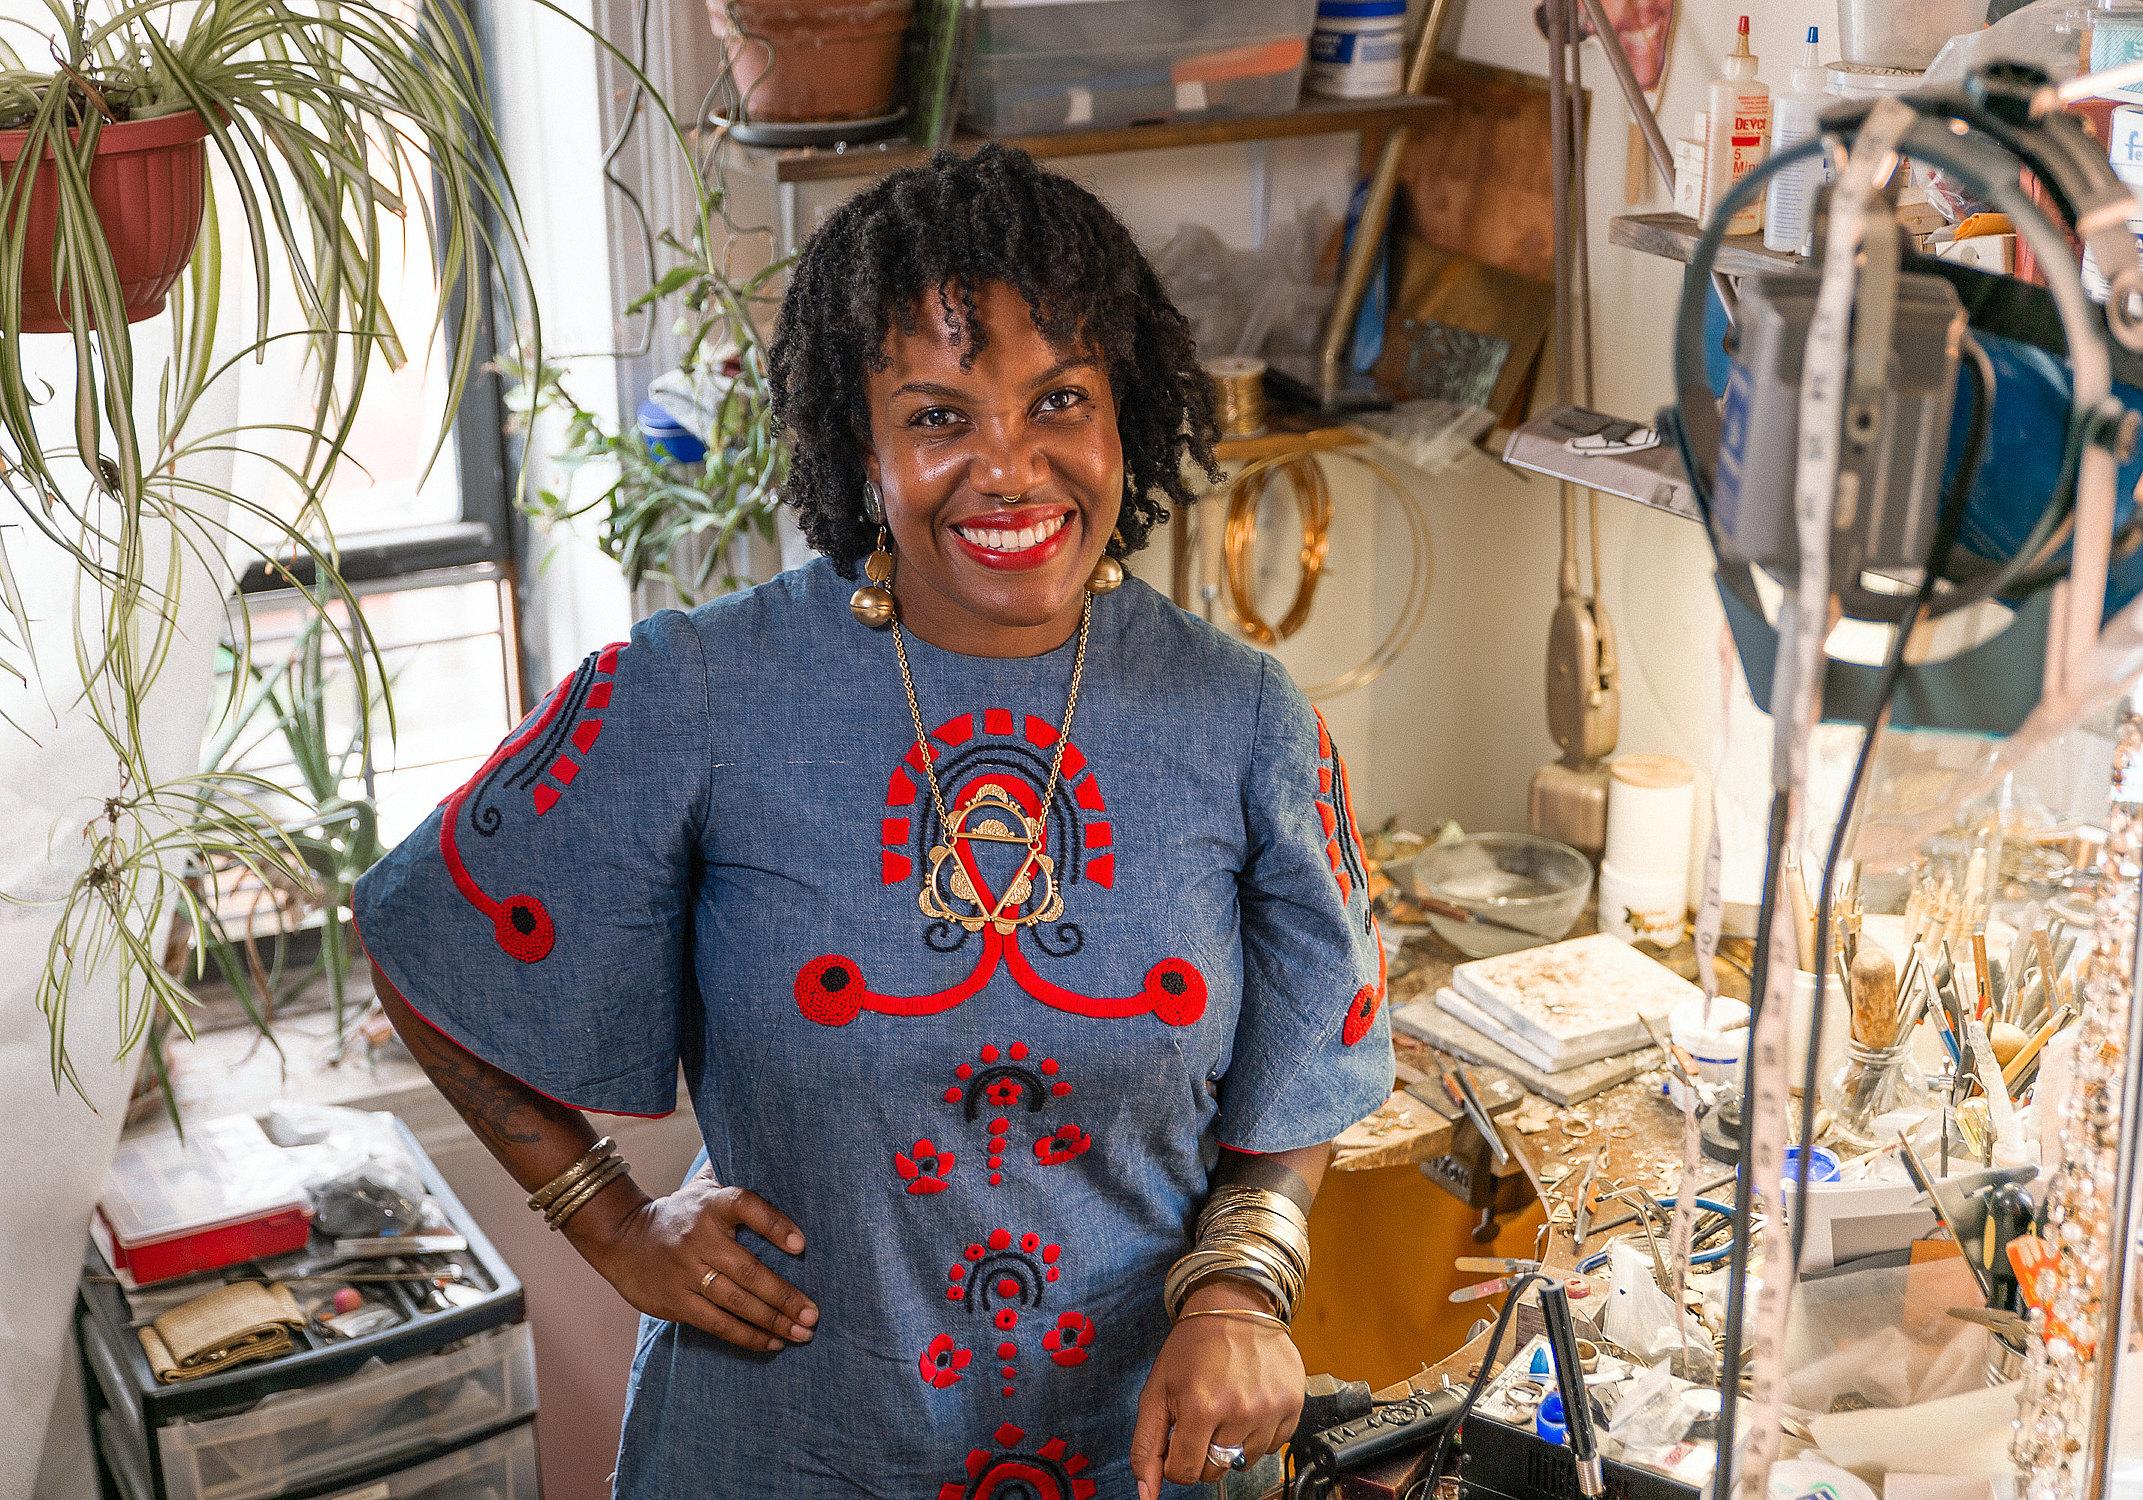 Lingua Nigra owner Alicia Goodwin in her jewelry studio